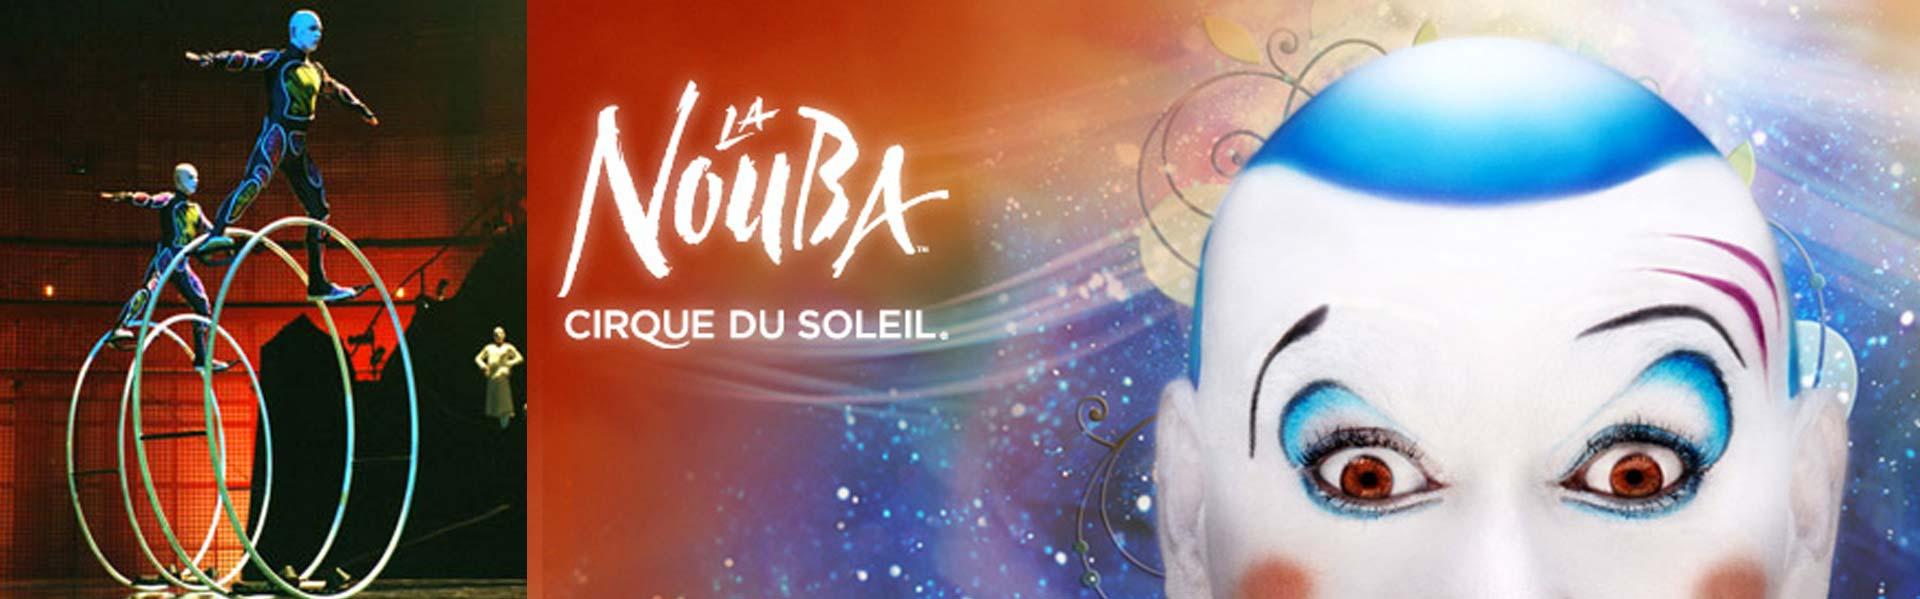 Cirque du Soleil – La Nouba